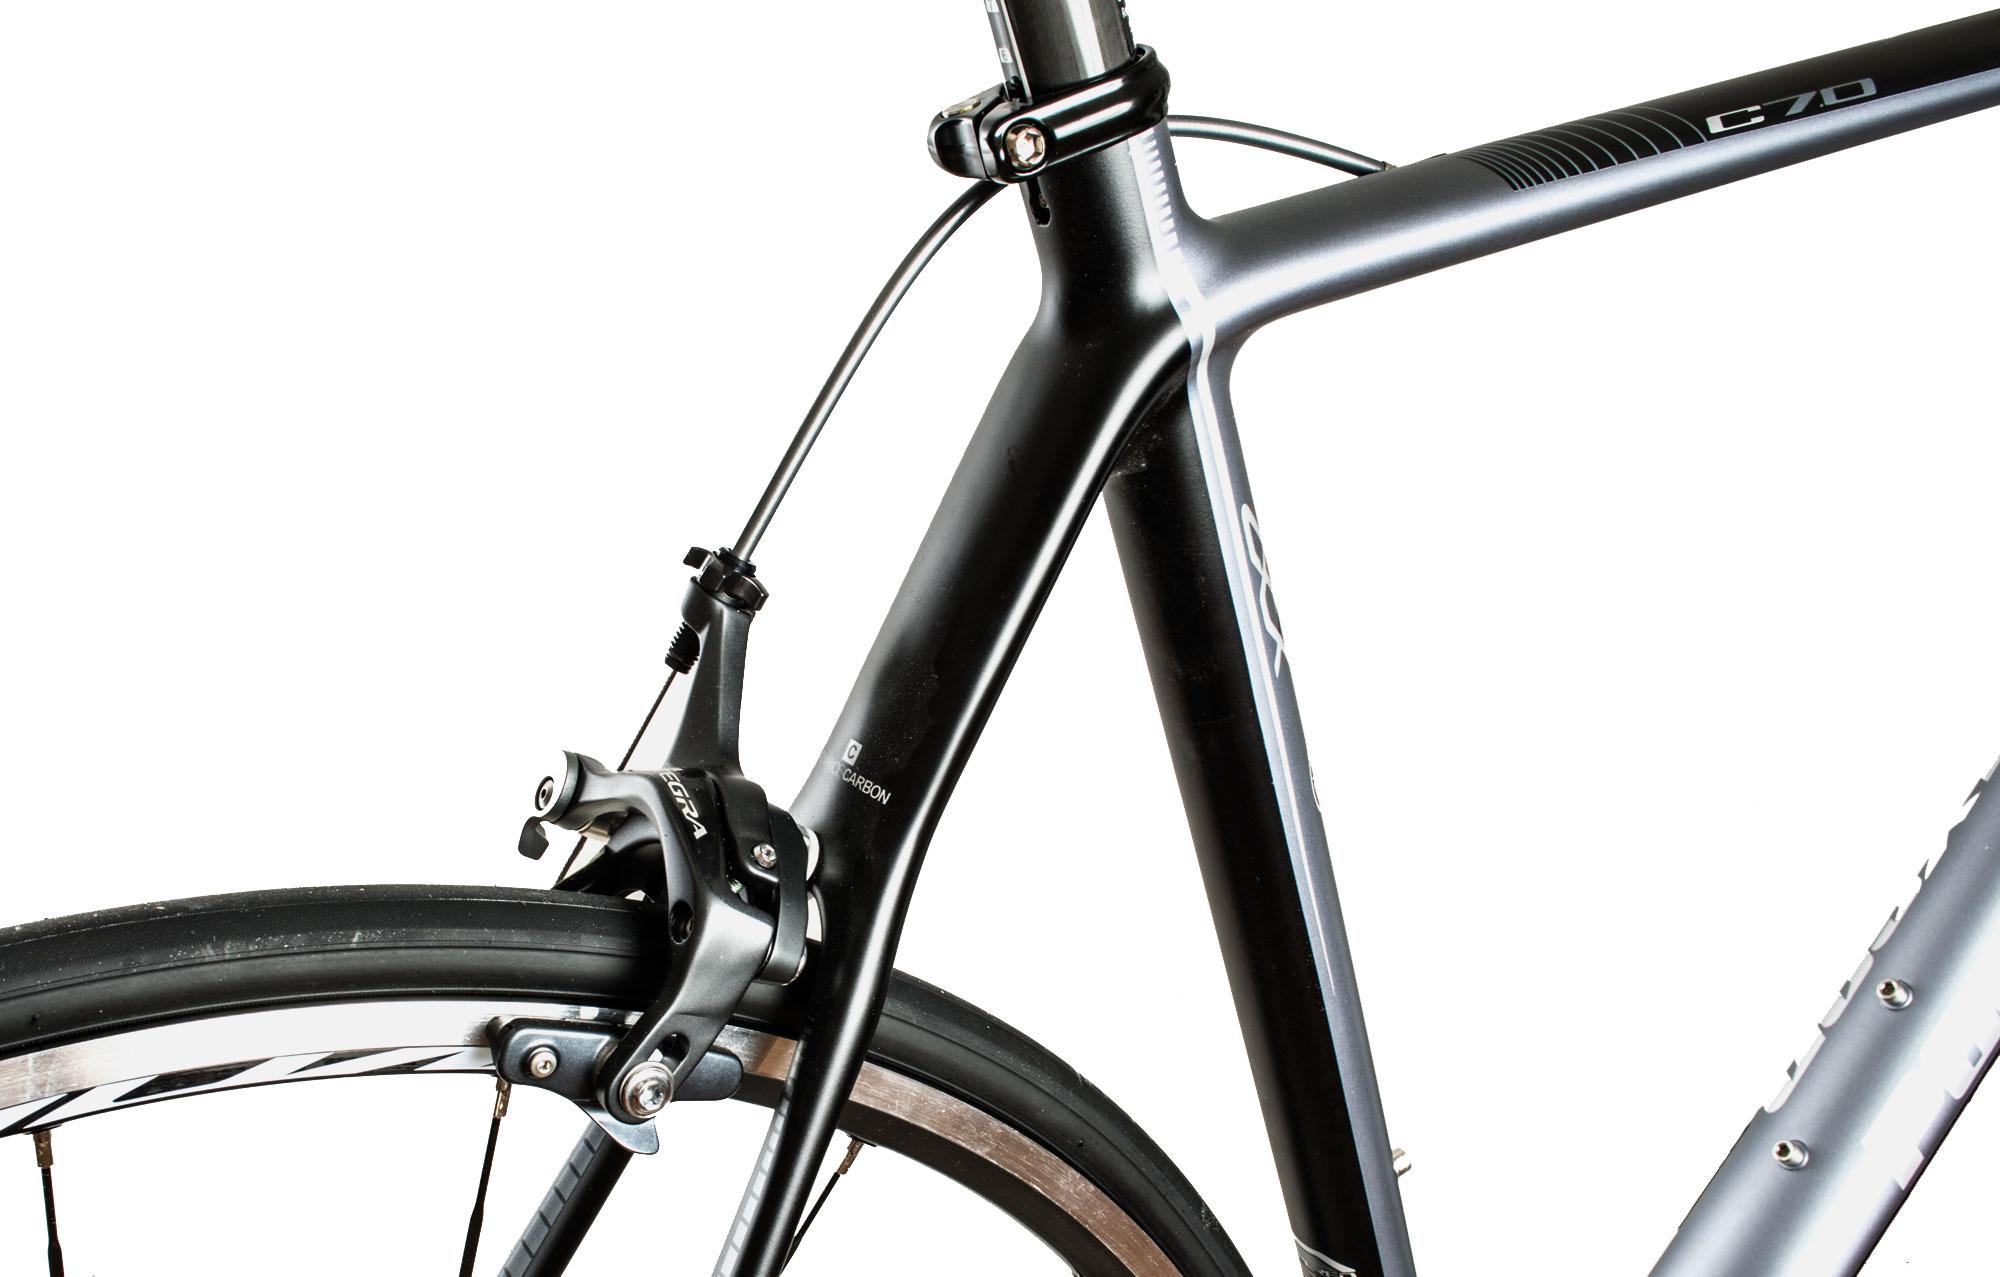 Polygon Helios C7.0 Road Bike - Carbon Ultegra 10 speed | Alltricks.com